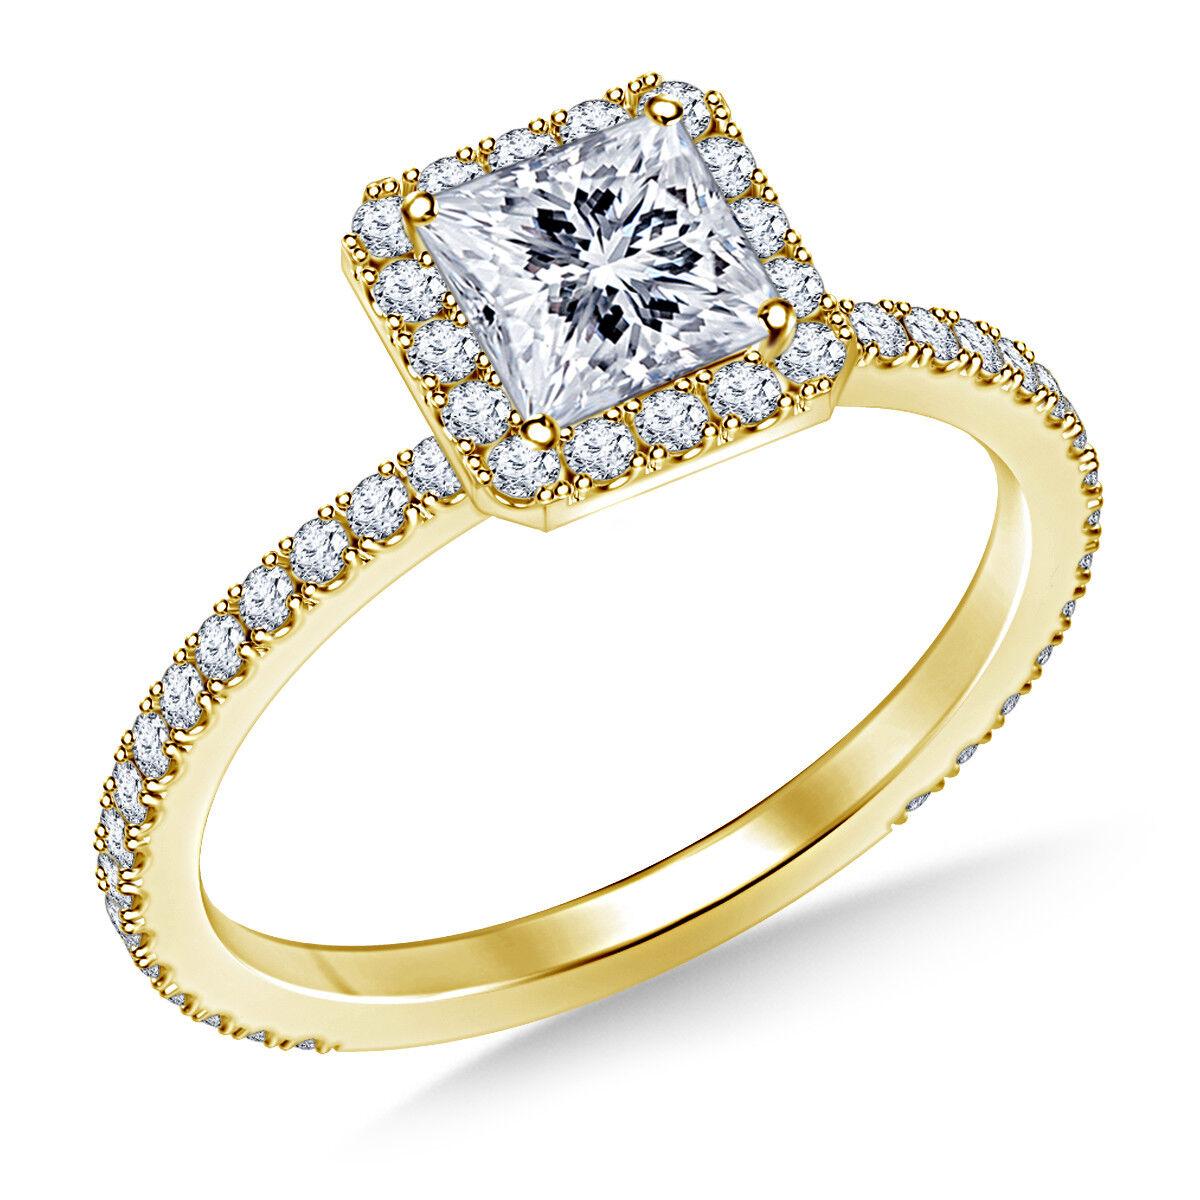 1.00 Ct VVS1 Princess Cut Solitaire Diamond Engagement Ring 18K Real Yellow gold